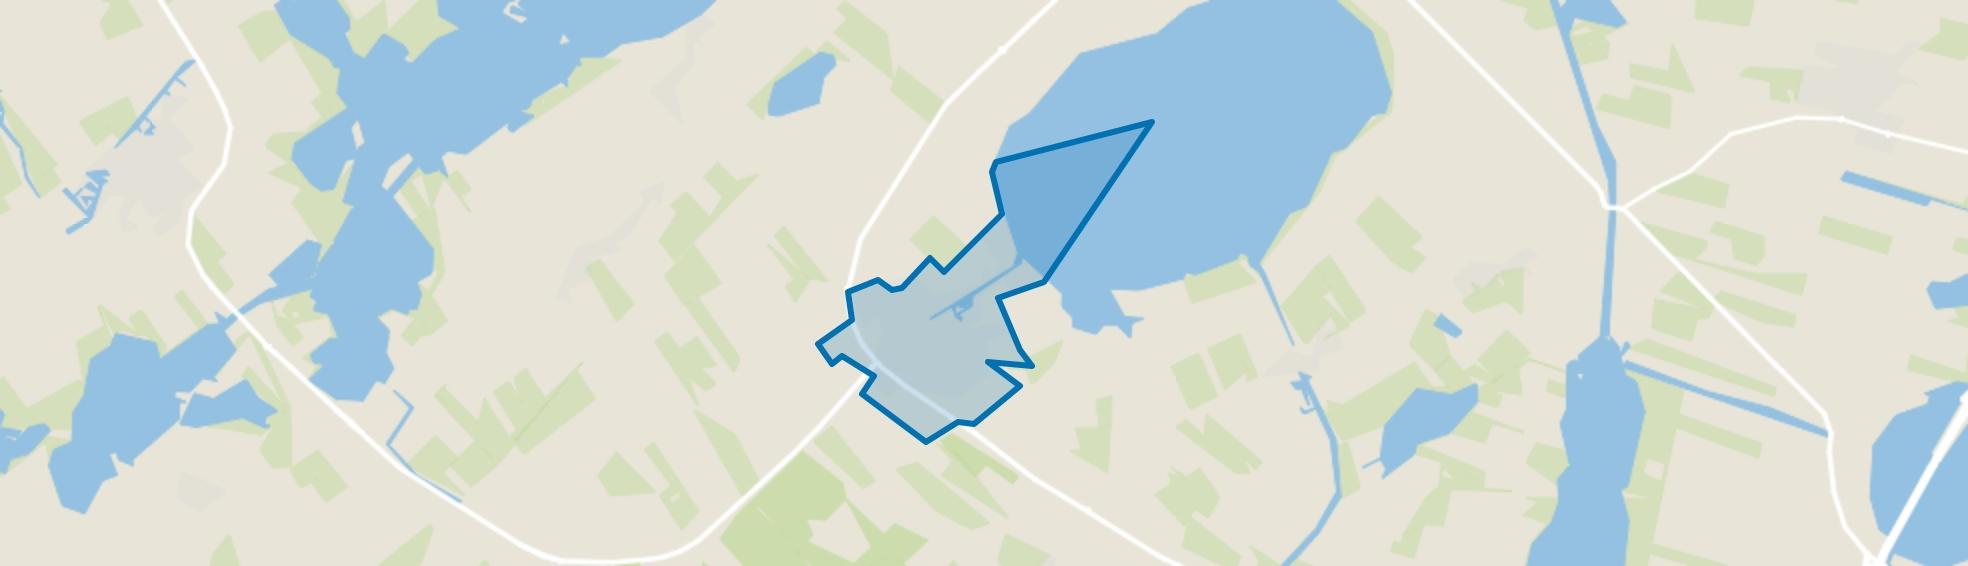 Balk, Balk map